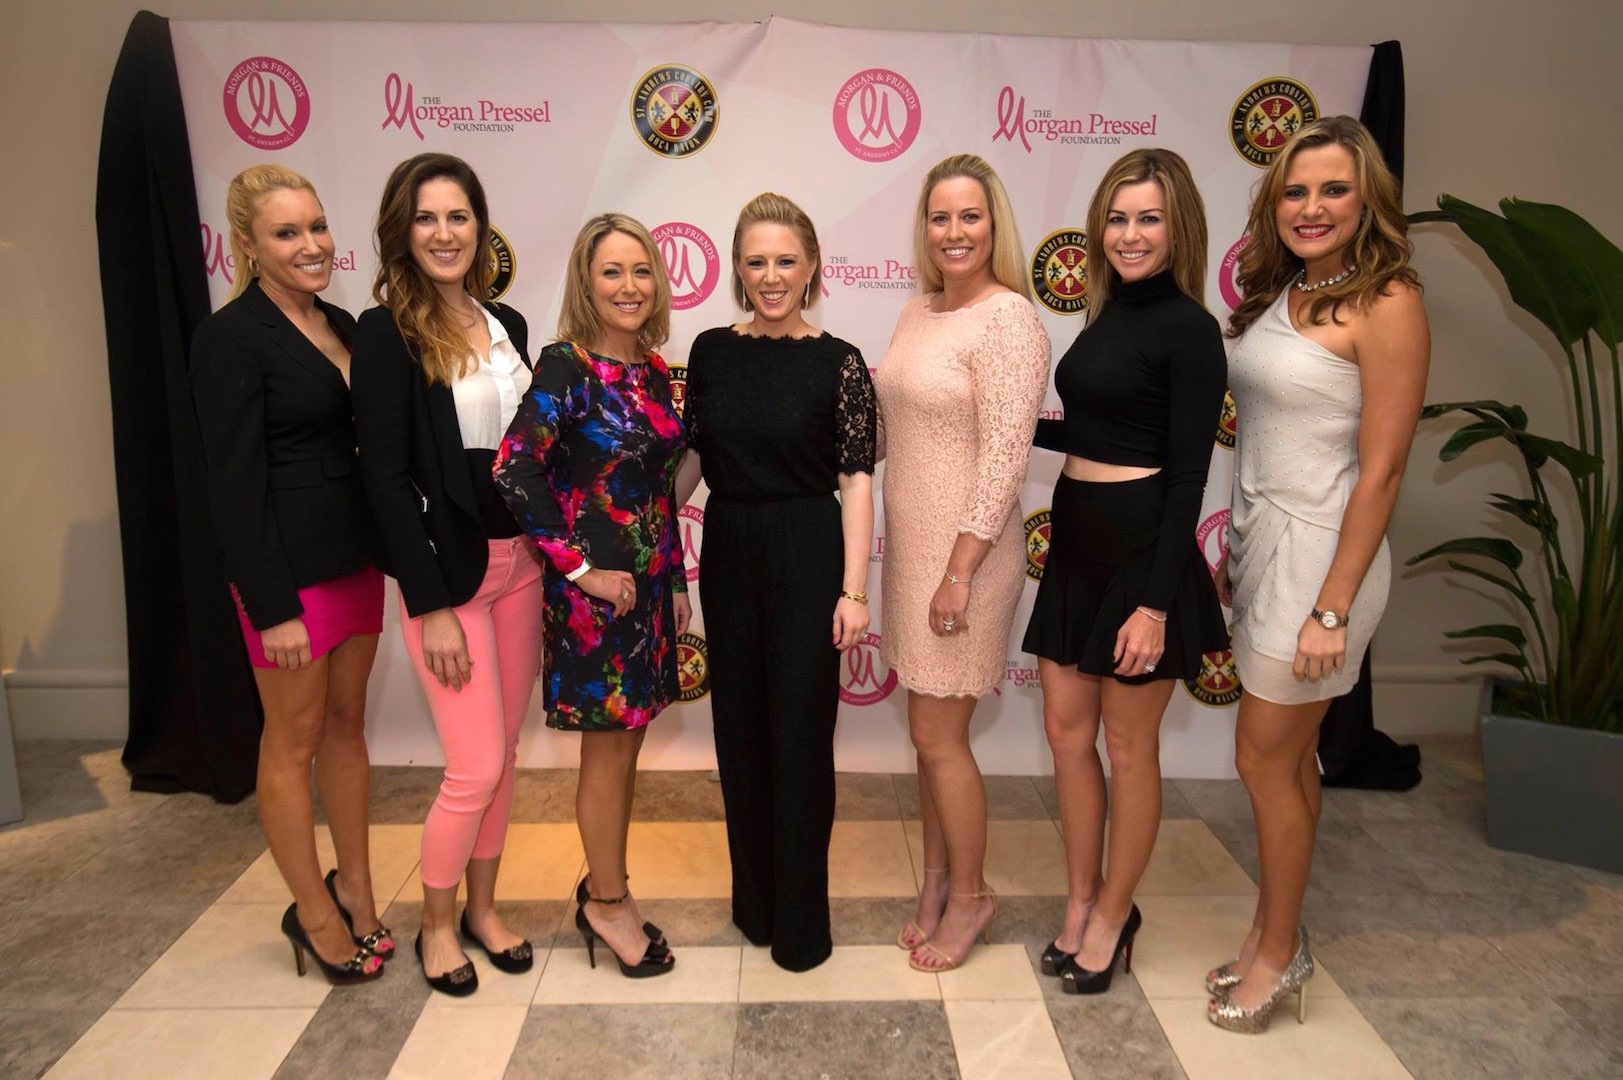 Morgan Pressel Foundation raises $1m for Breast Cancer